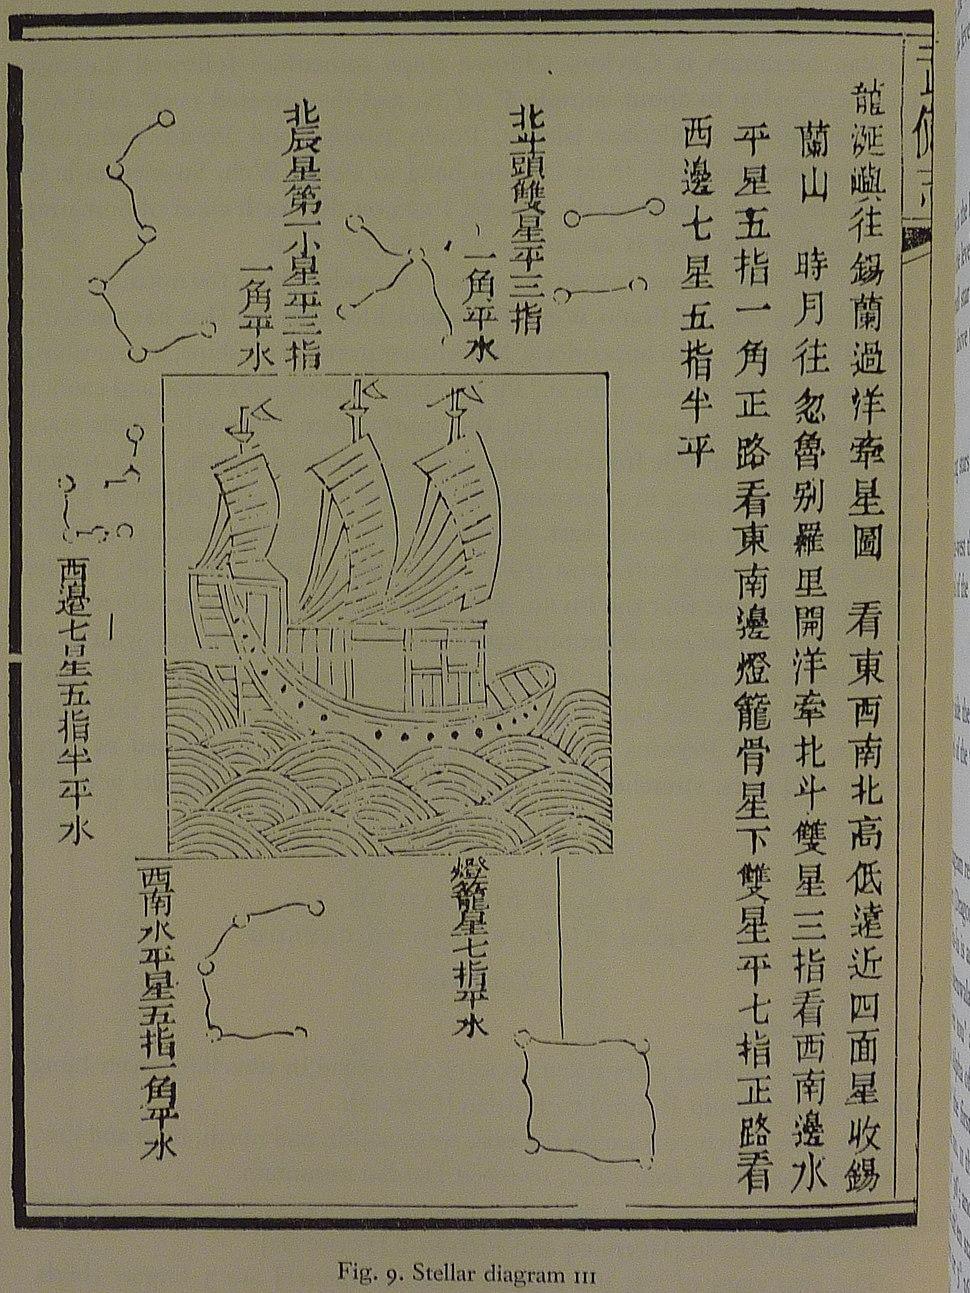 Mao Kun Map - stellar diagram 3 - P1100092